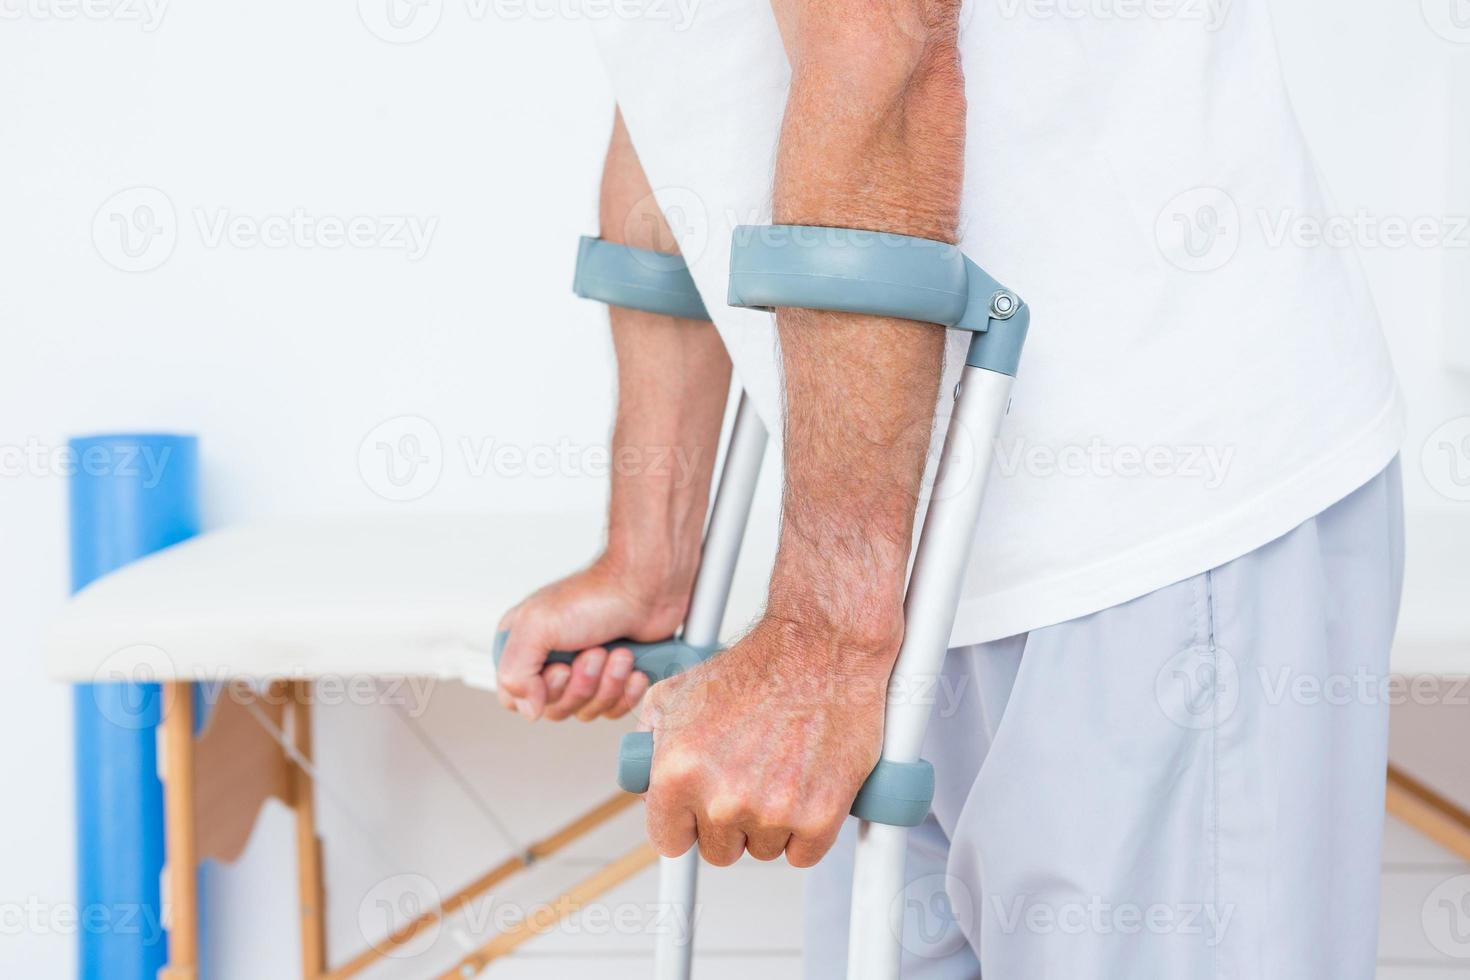 patiënt staat met kruk foto